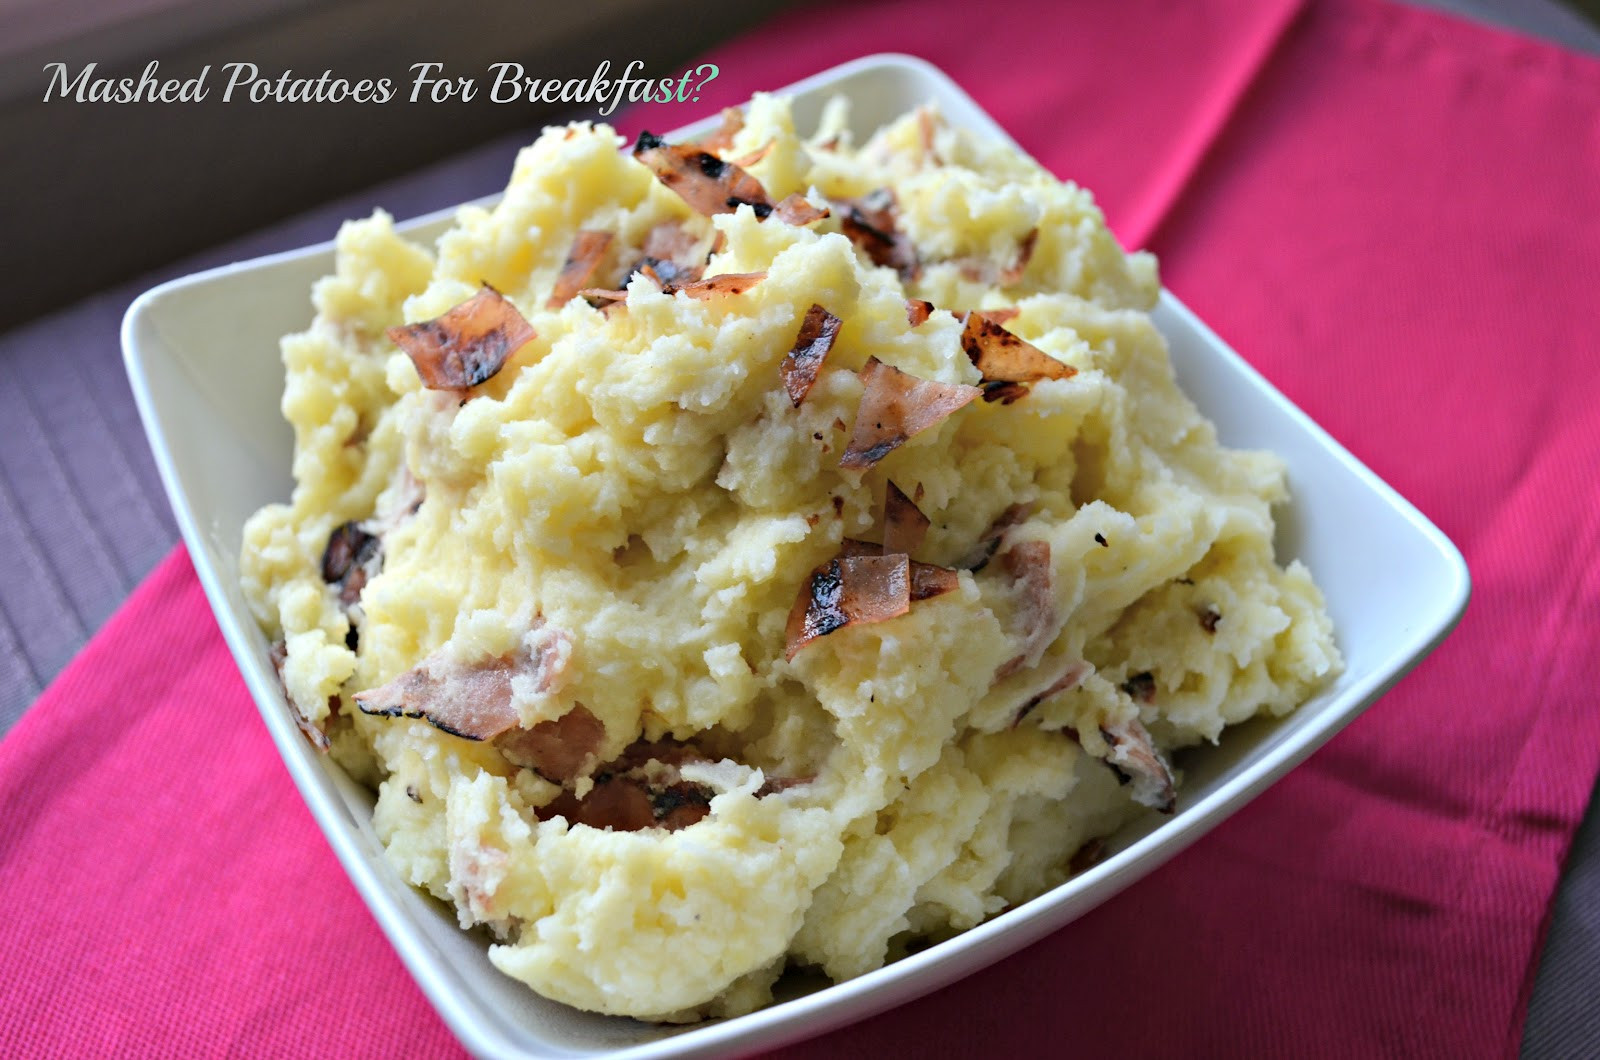 Breakfast Mashed Potatoes  MASHED POTATOES FOR BREAKFAST